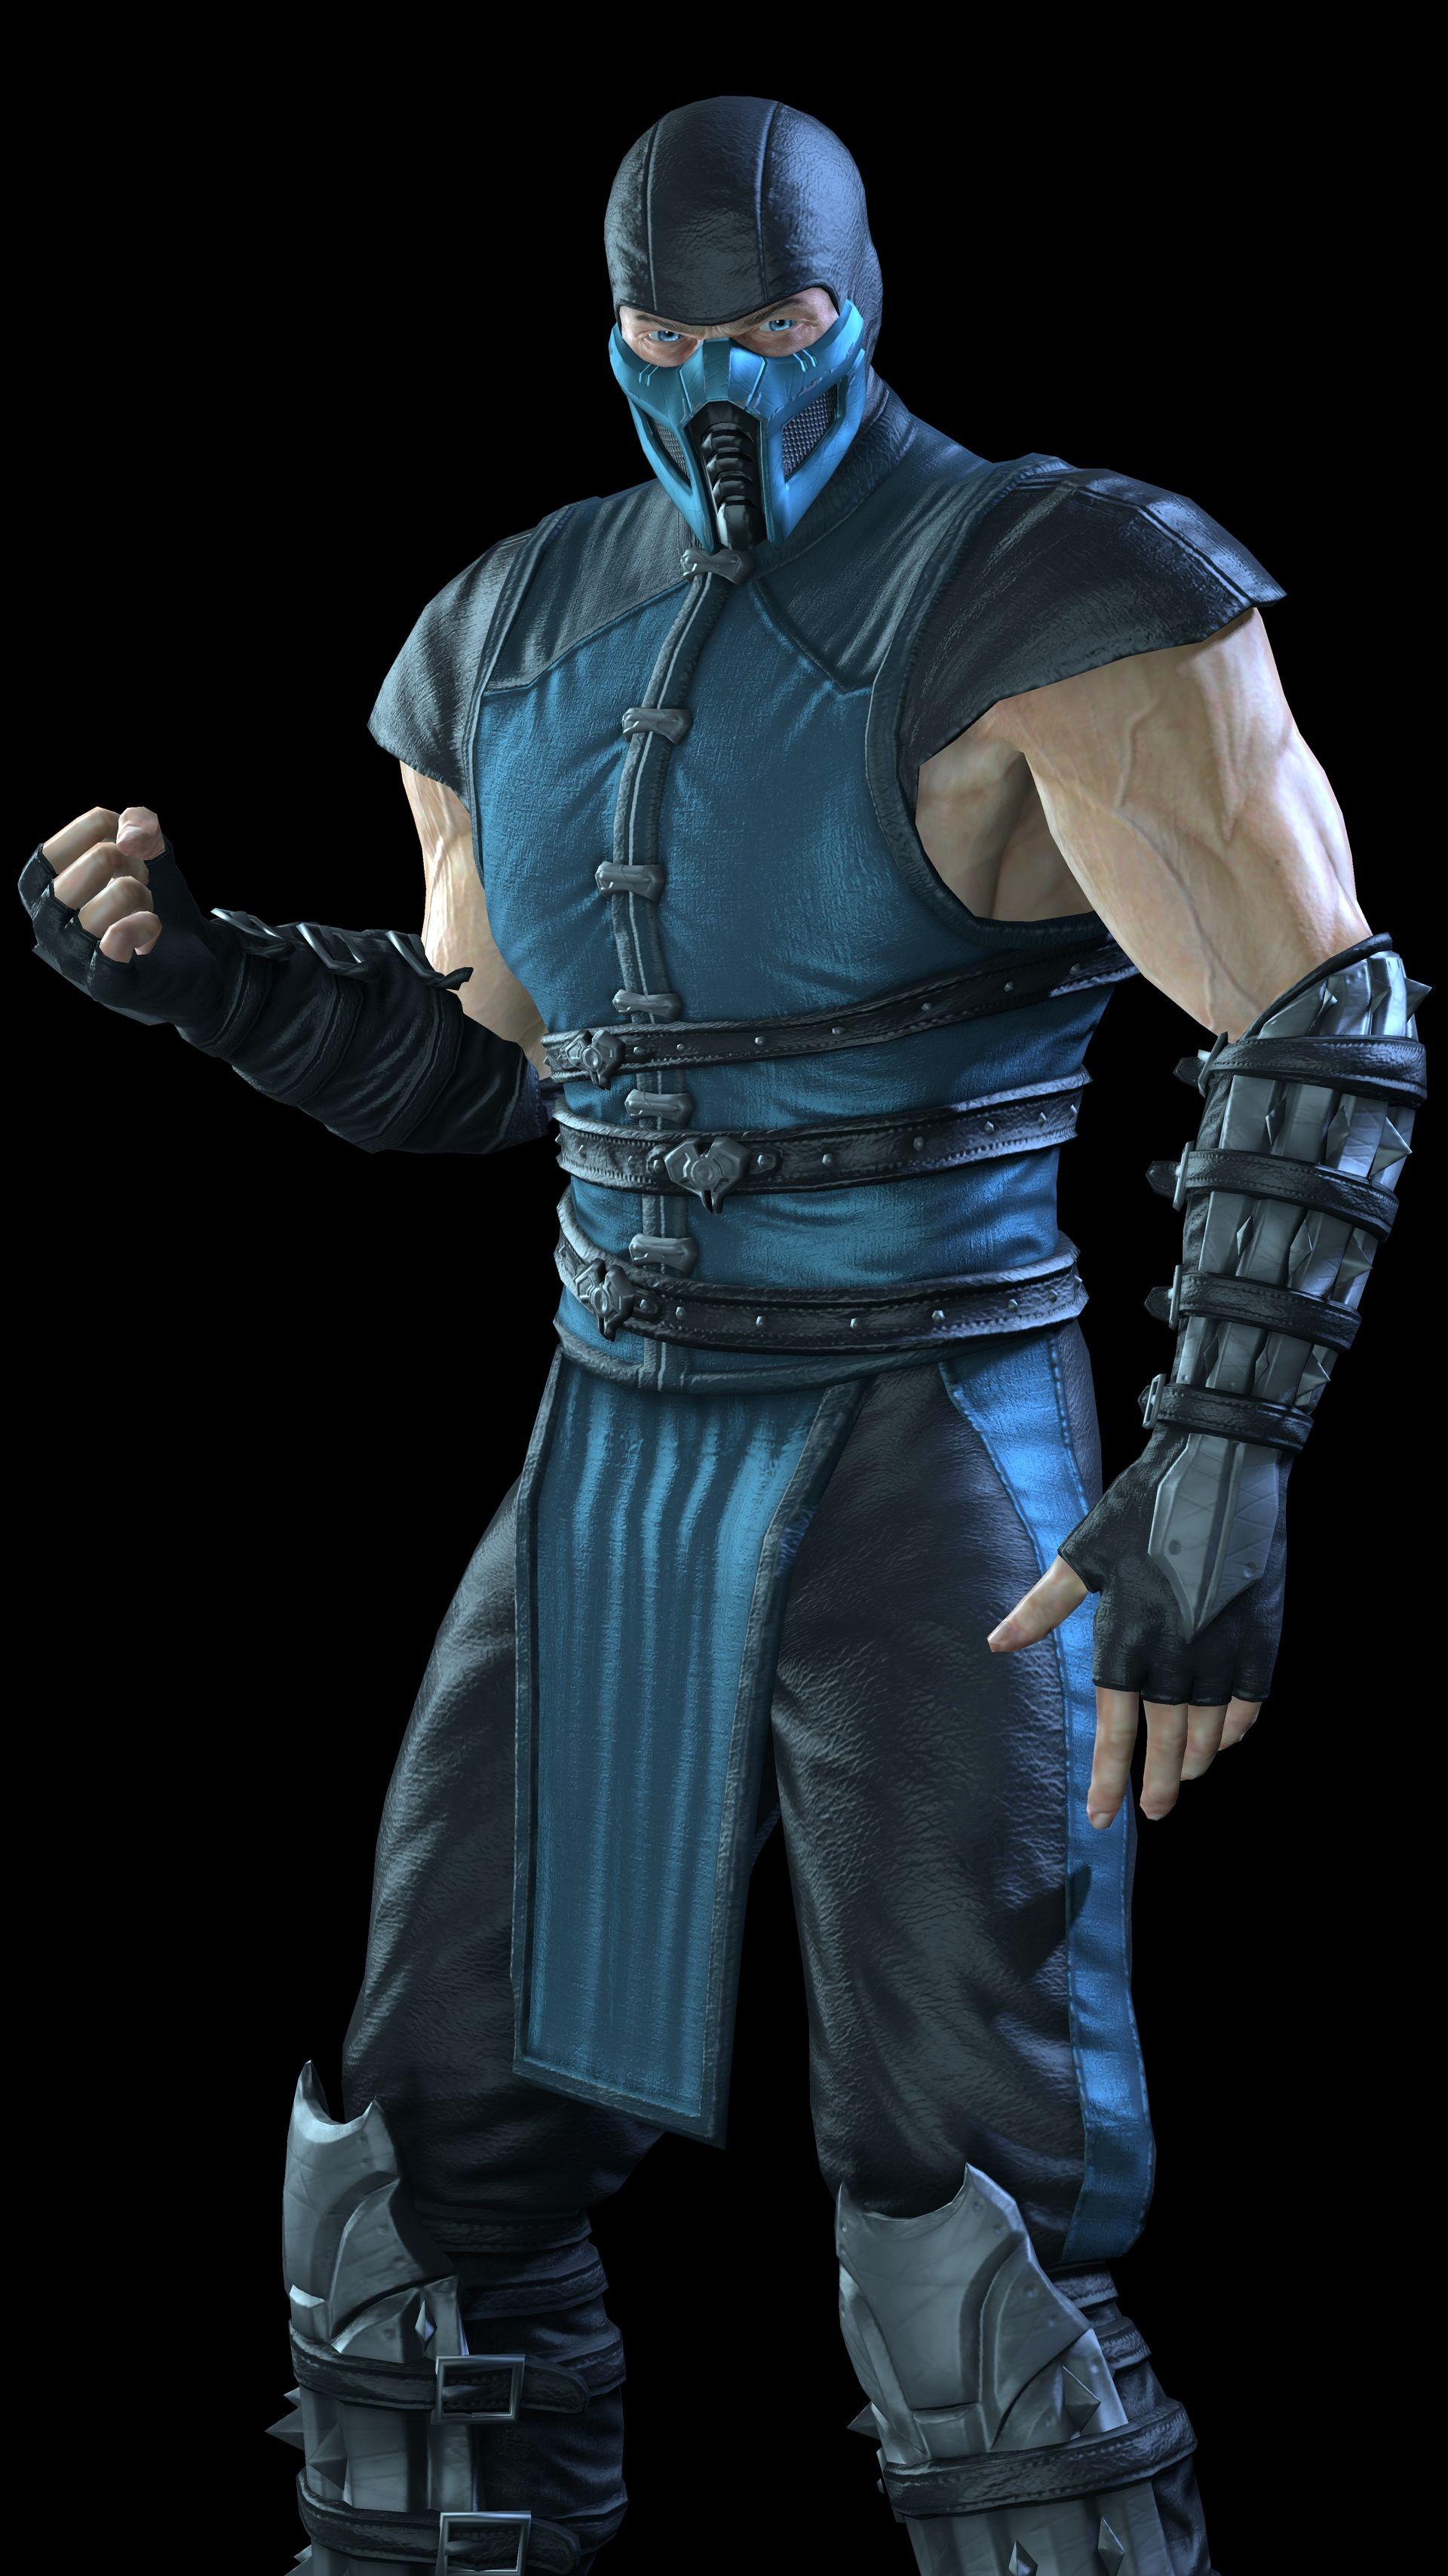 Steam Workshop :: MK9 : Sub-Zero Bi-Han | Mortal Kombat ... - photo#2